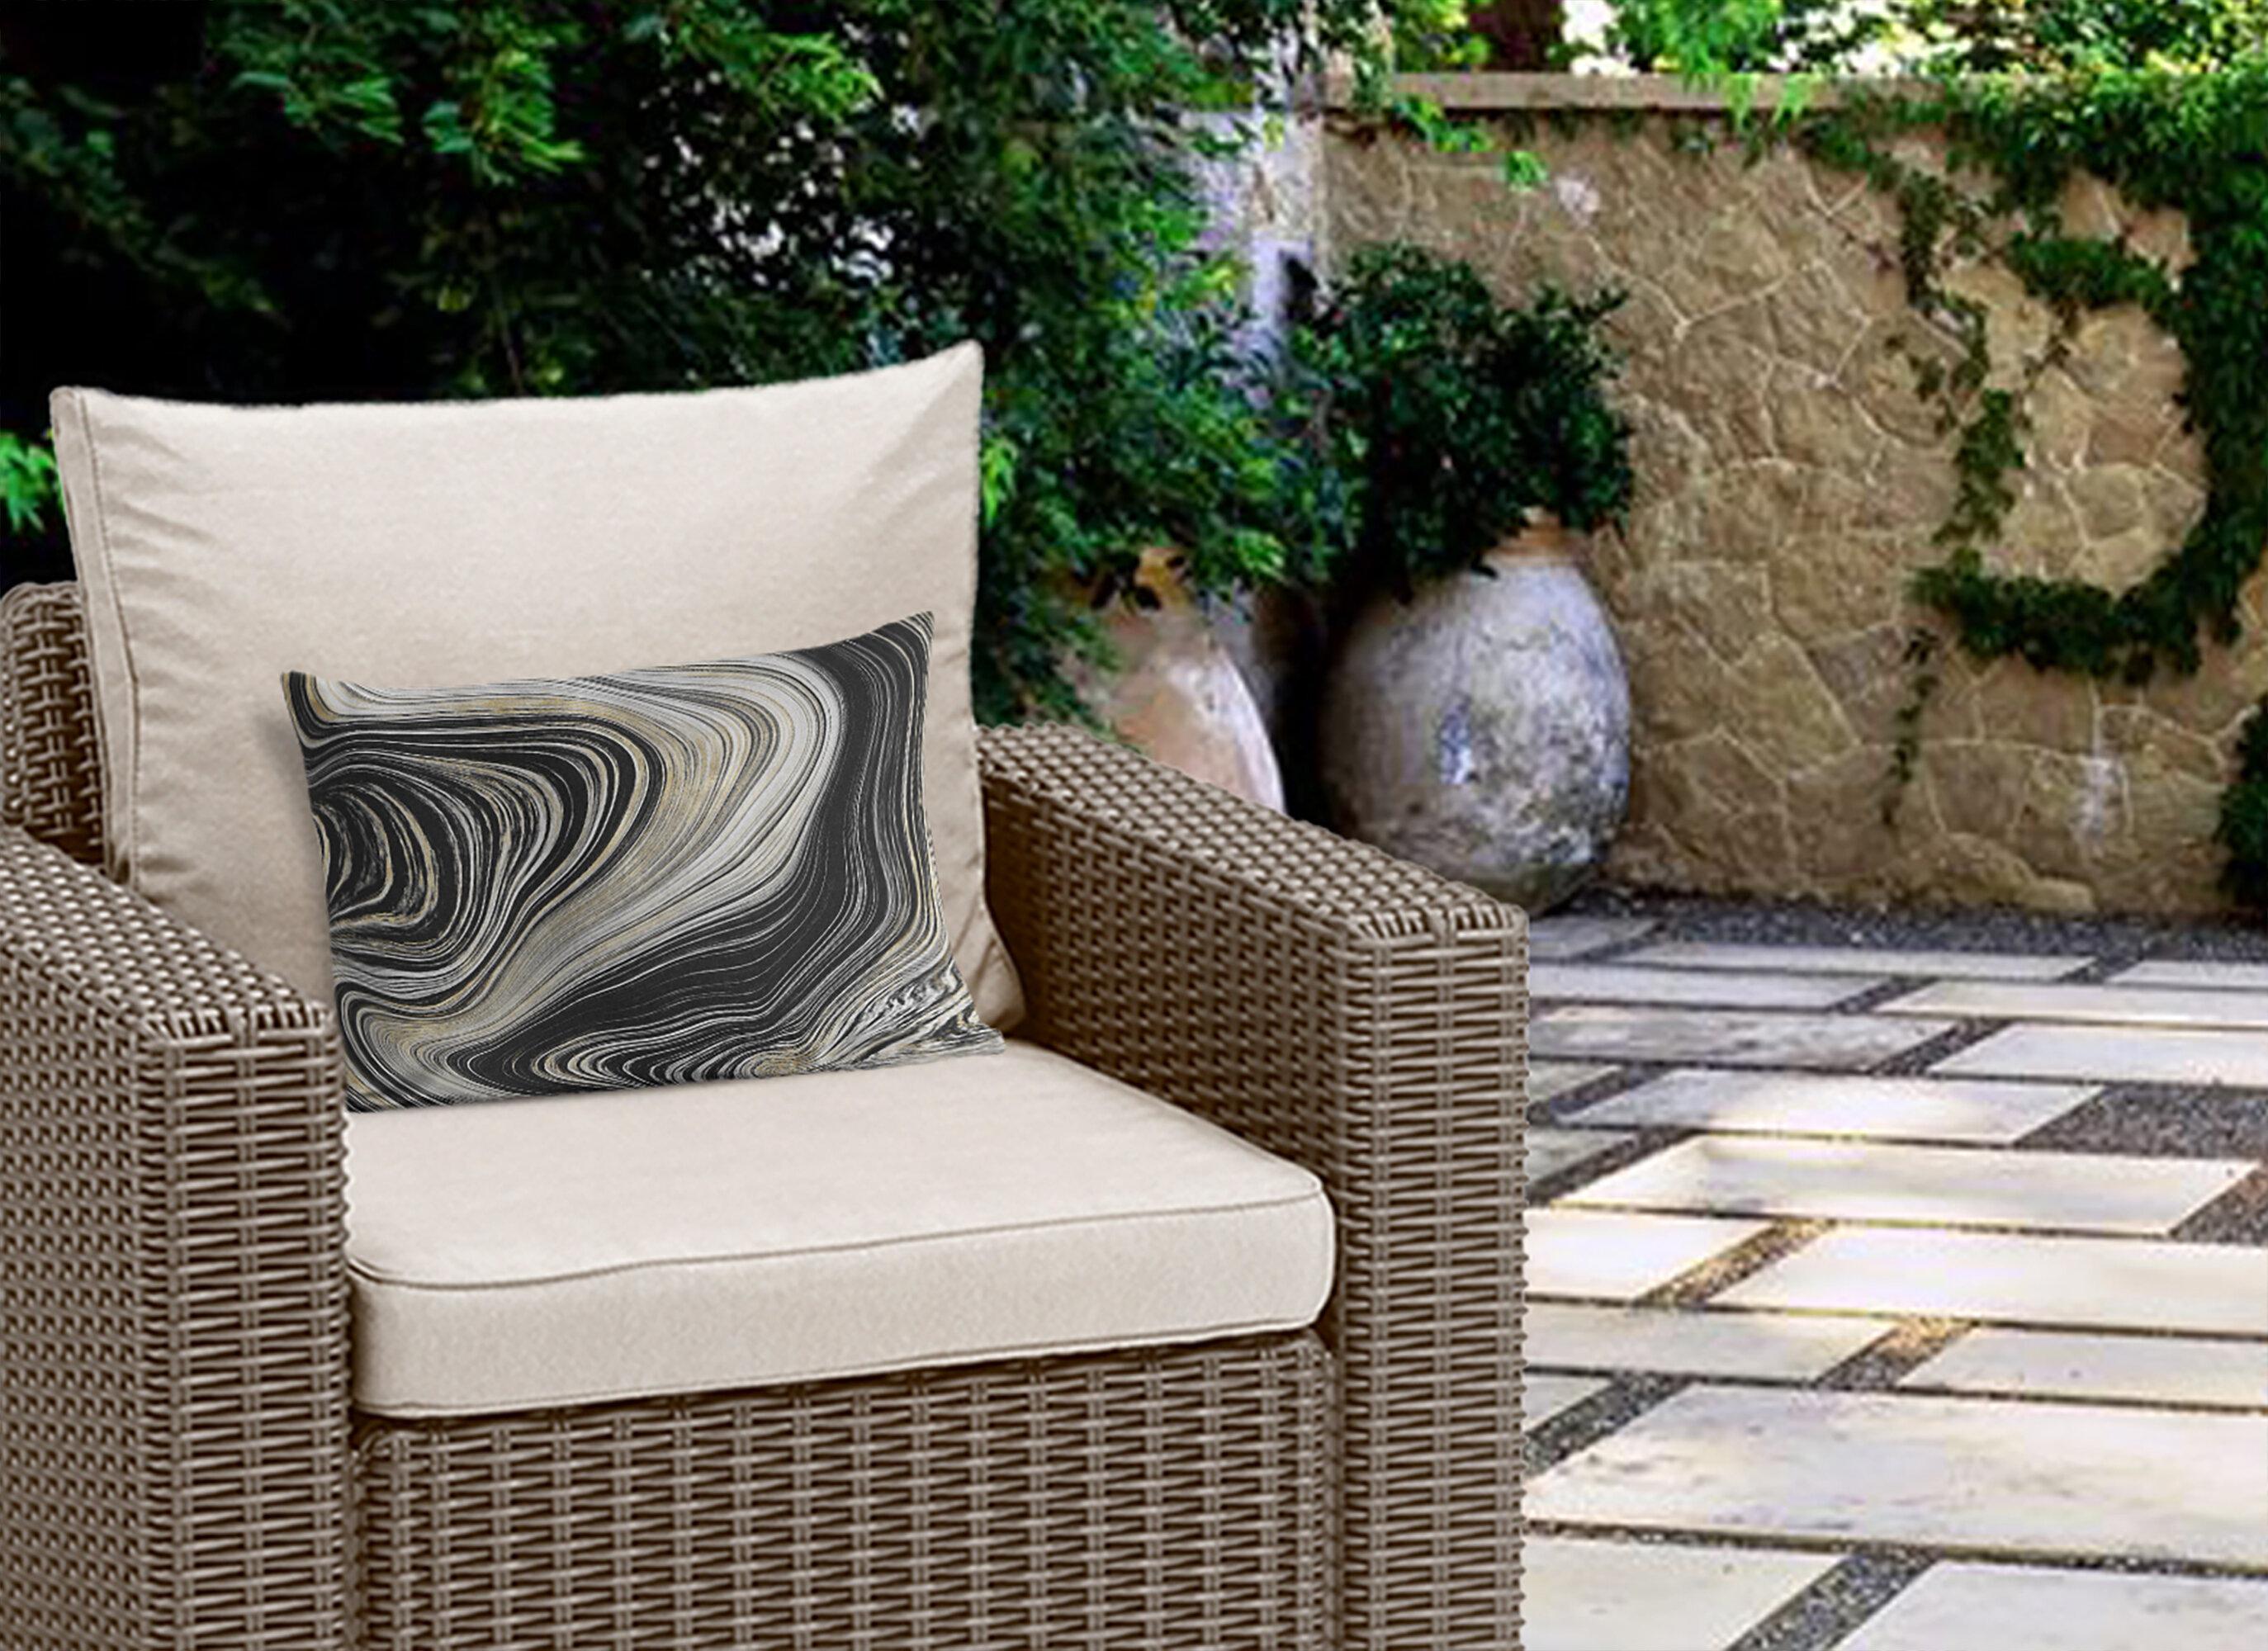 Black Posh Luxe Outdoor Pillows You Ll Love In 2021 Wayfair